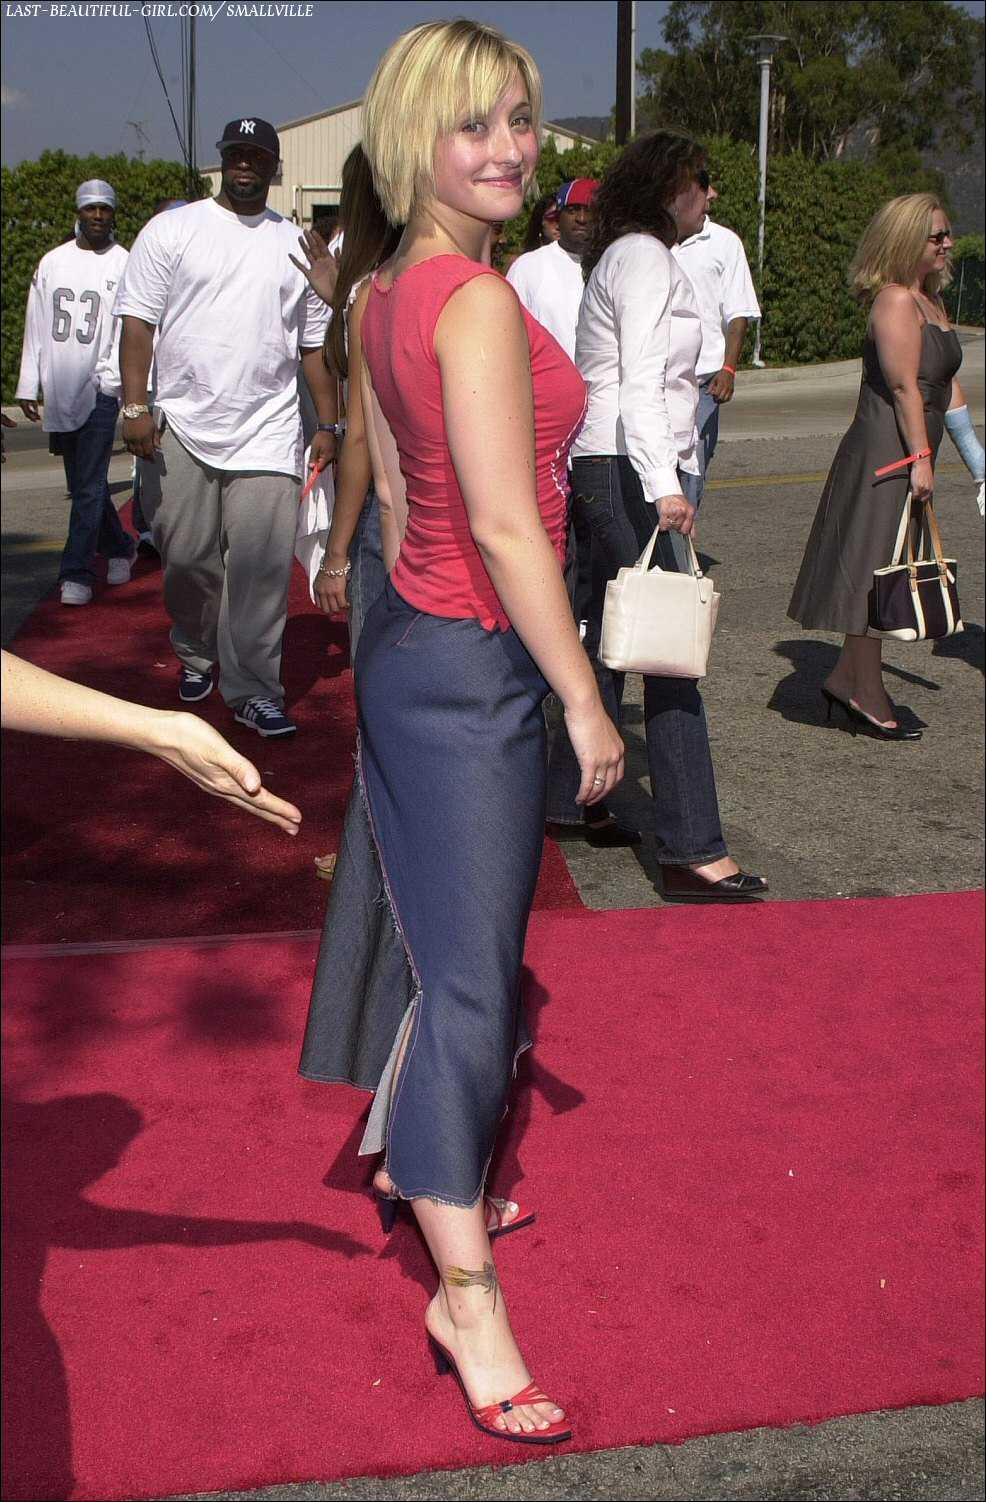 Allison Mack feet high heels